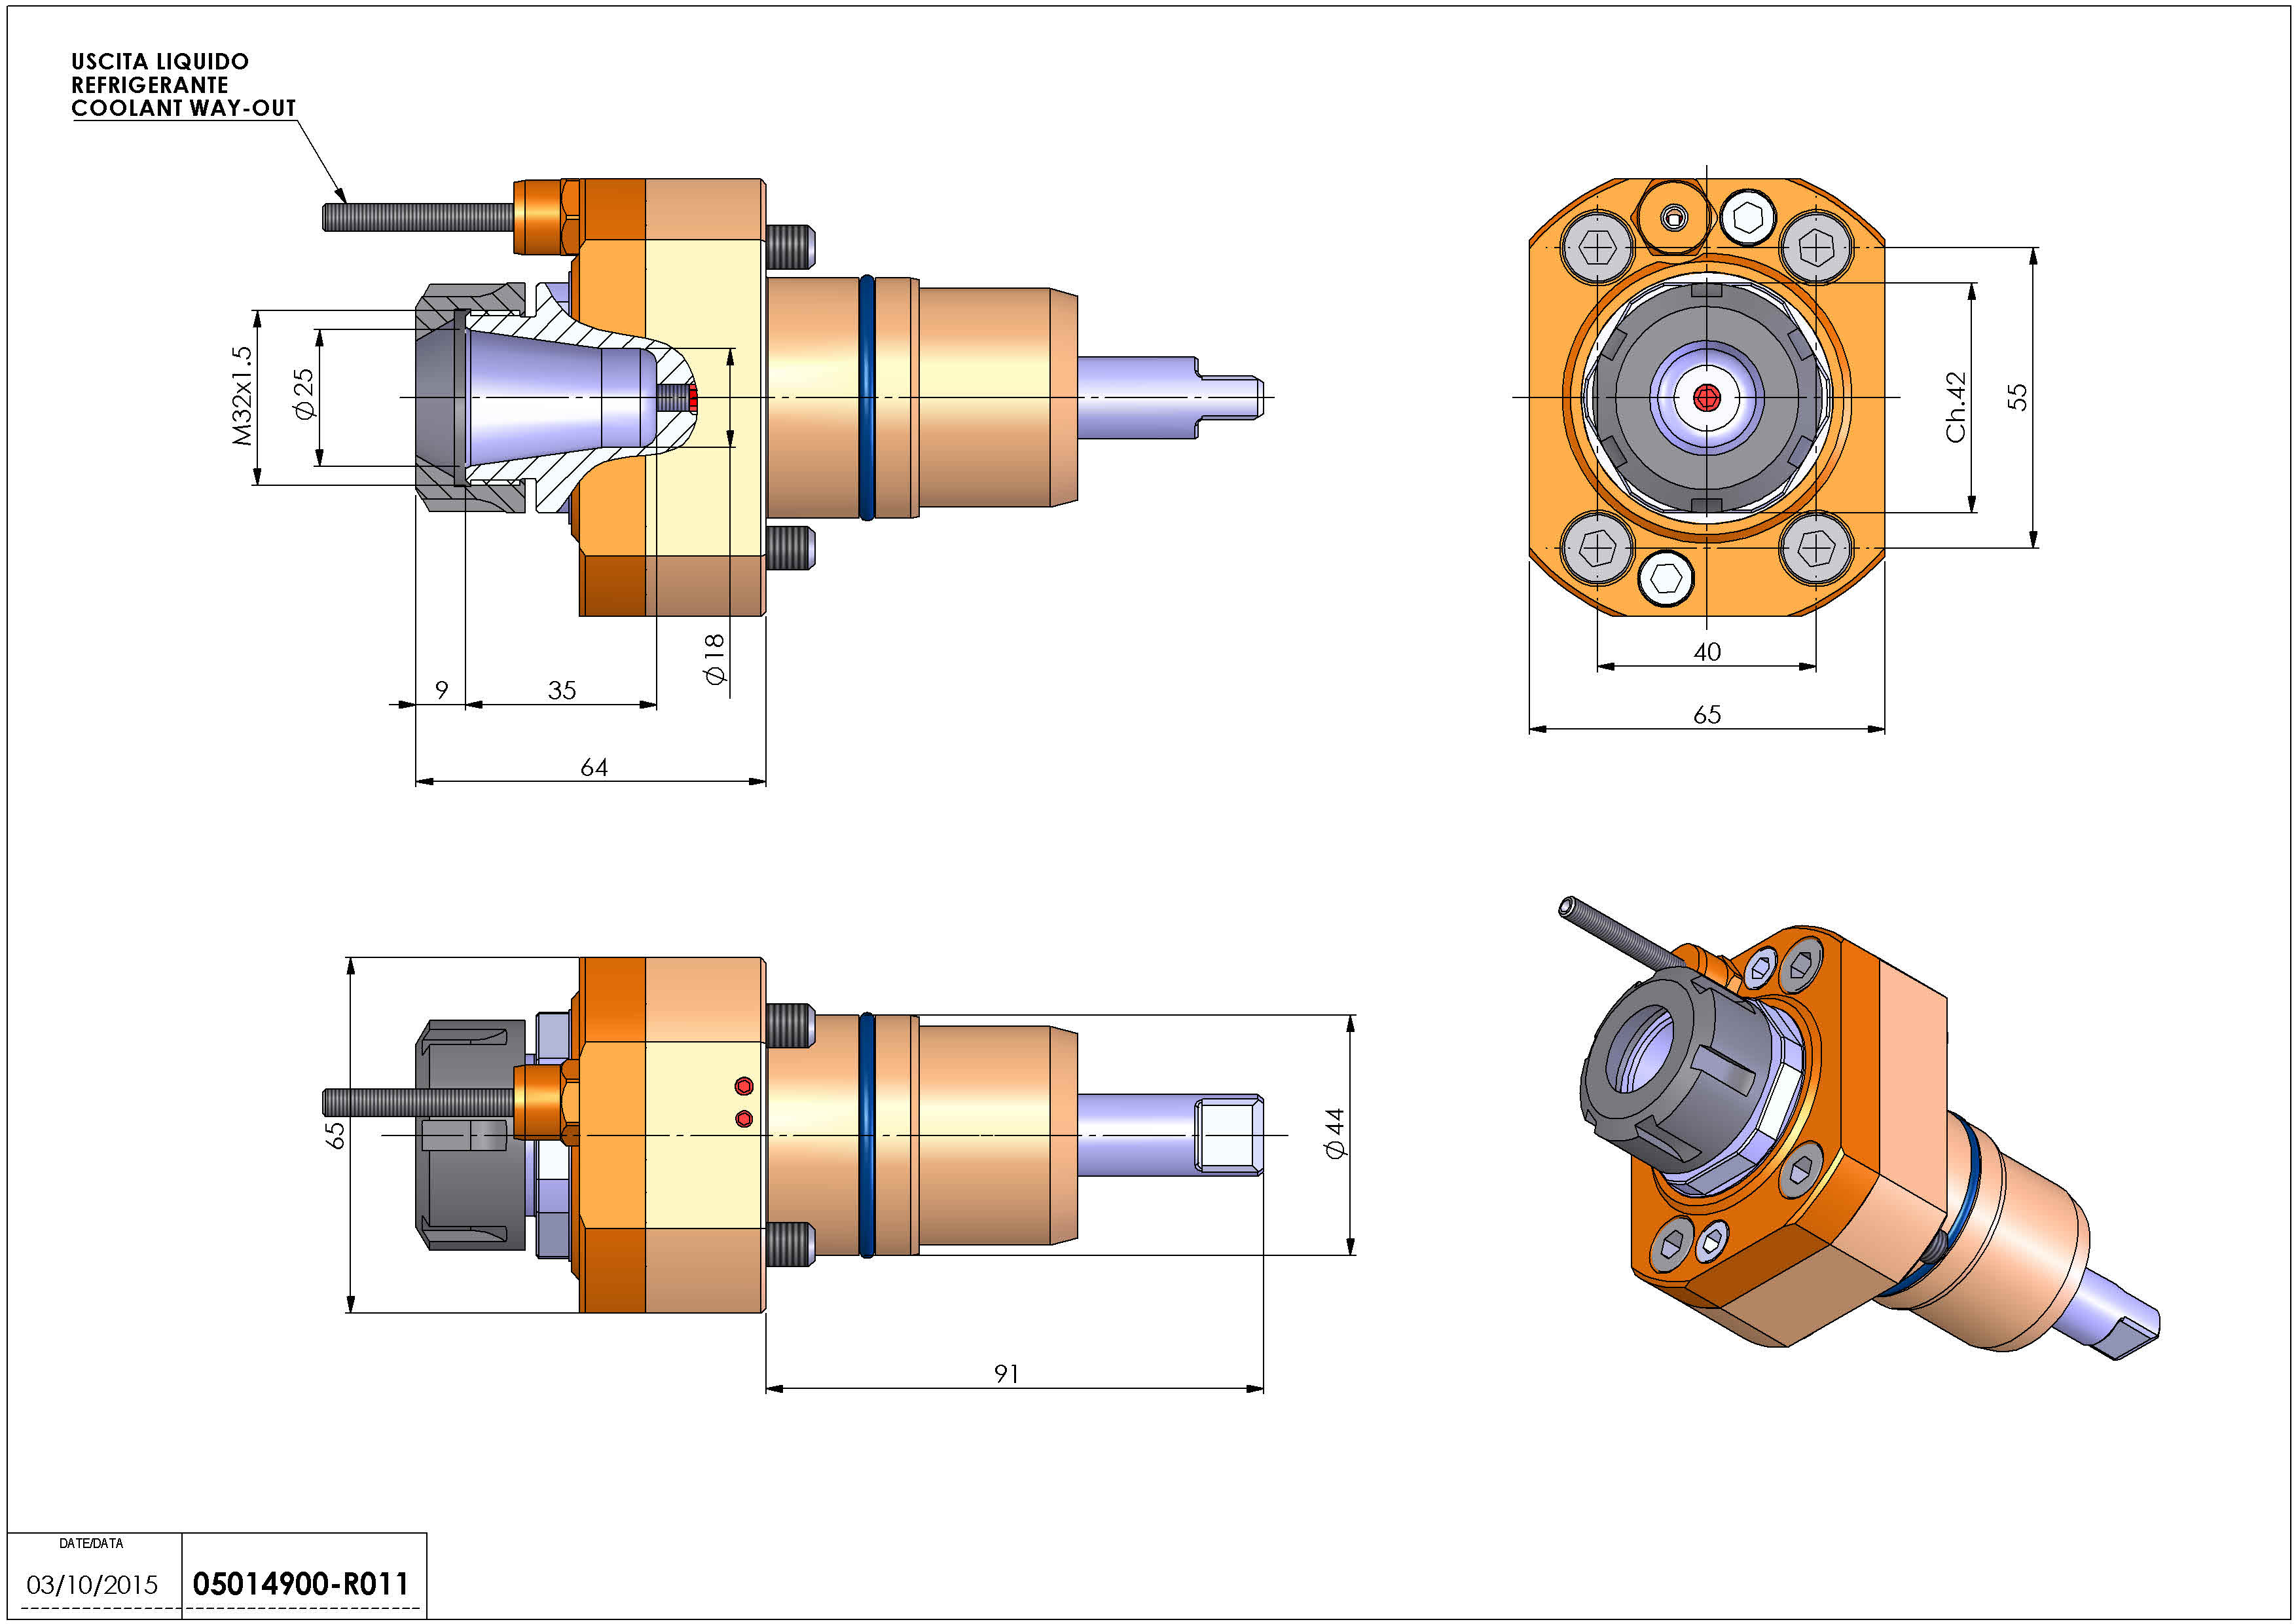 Technical image - LT-S D44 ER25 H64 NK.